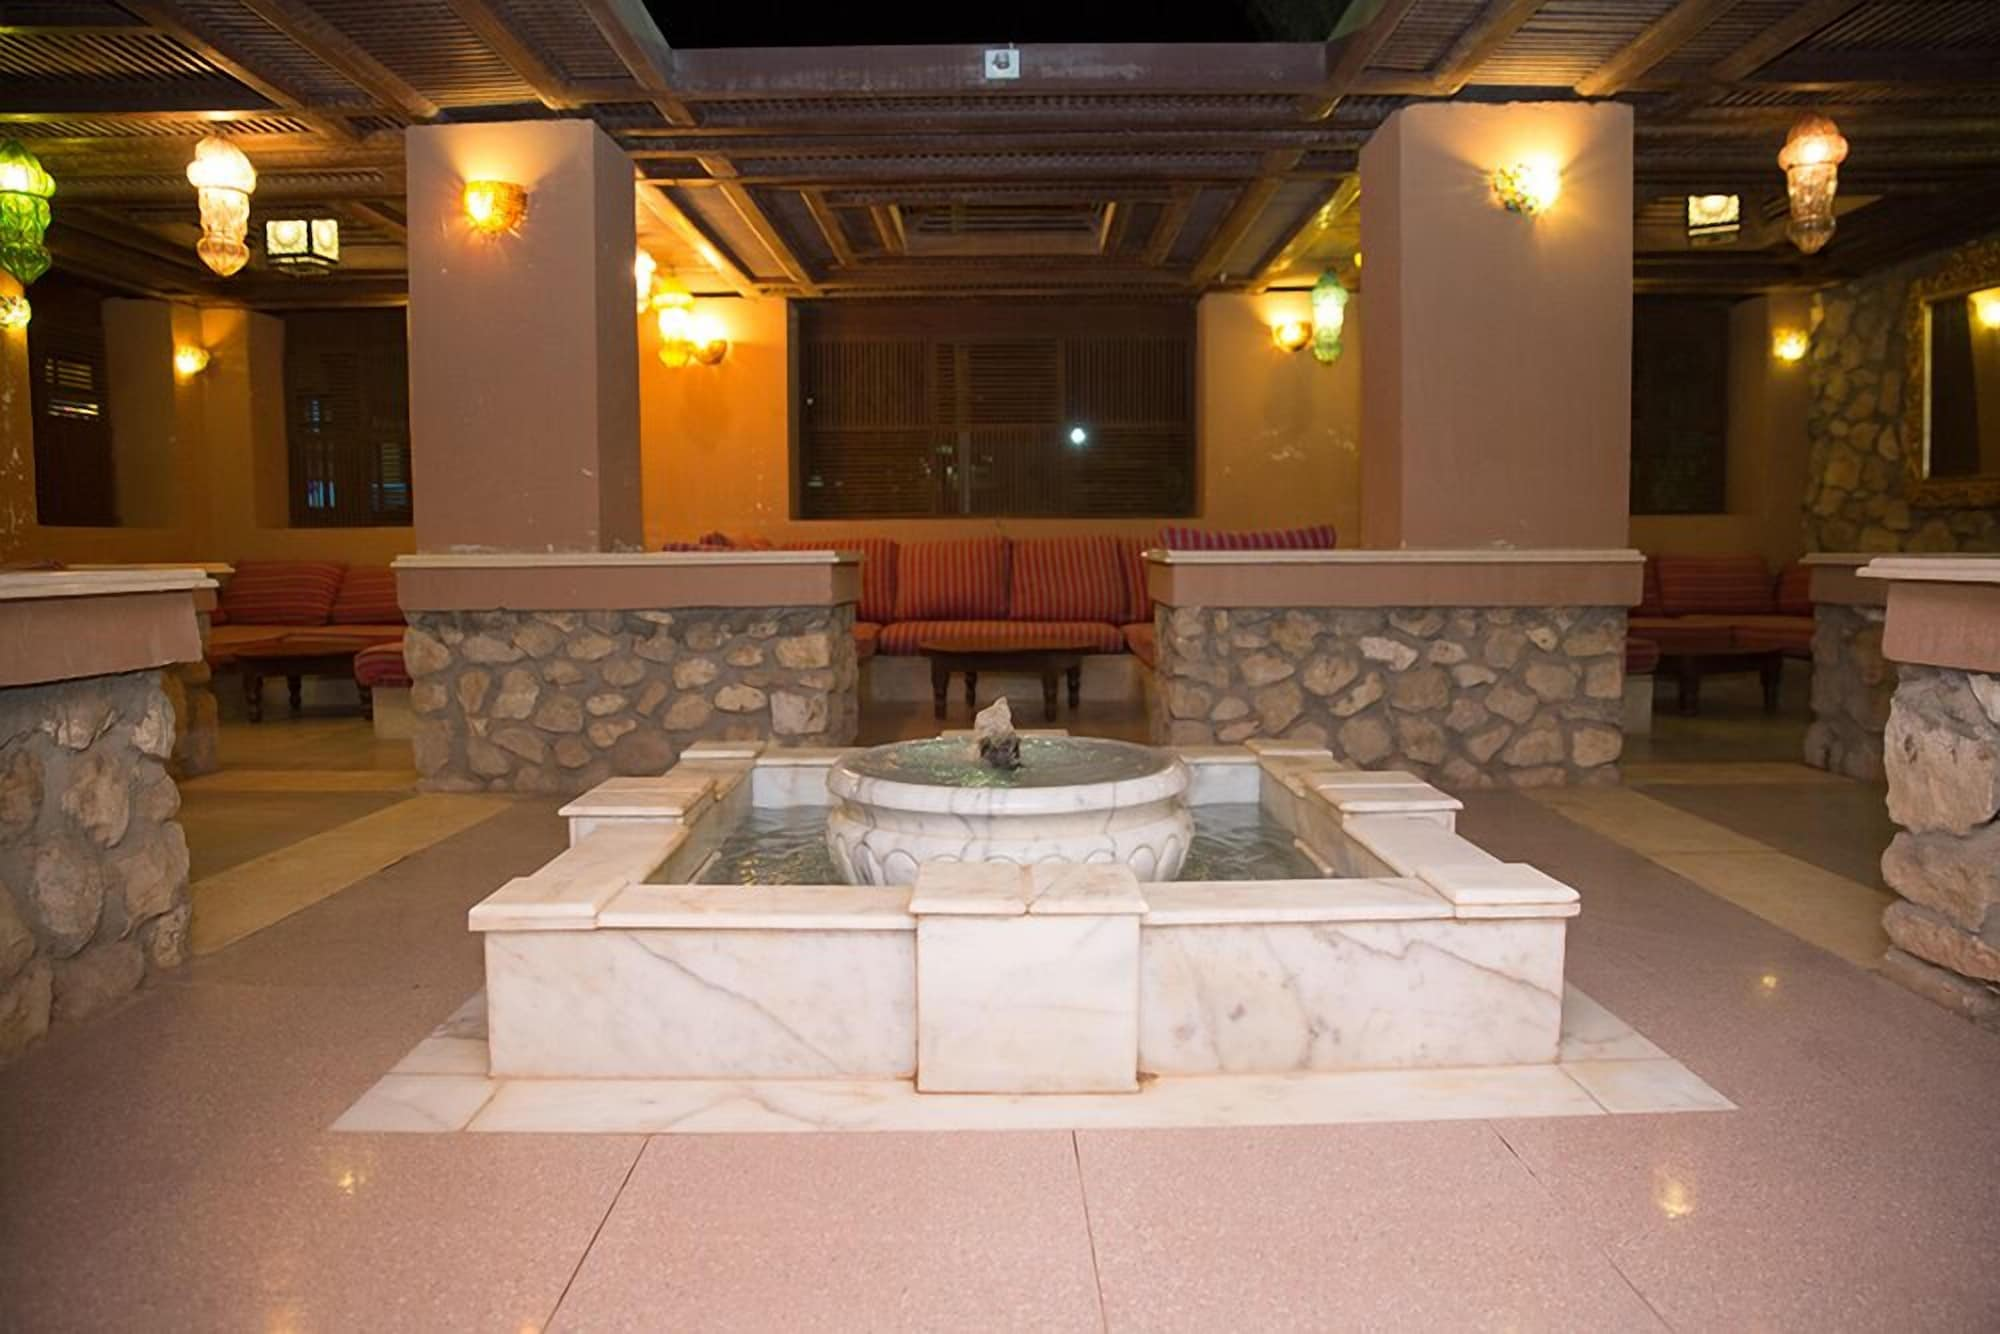 Romance Hotel Ain Sokhna, 'Ataqah